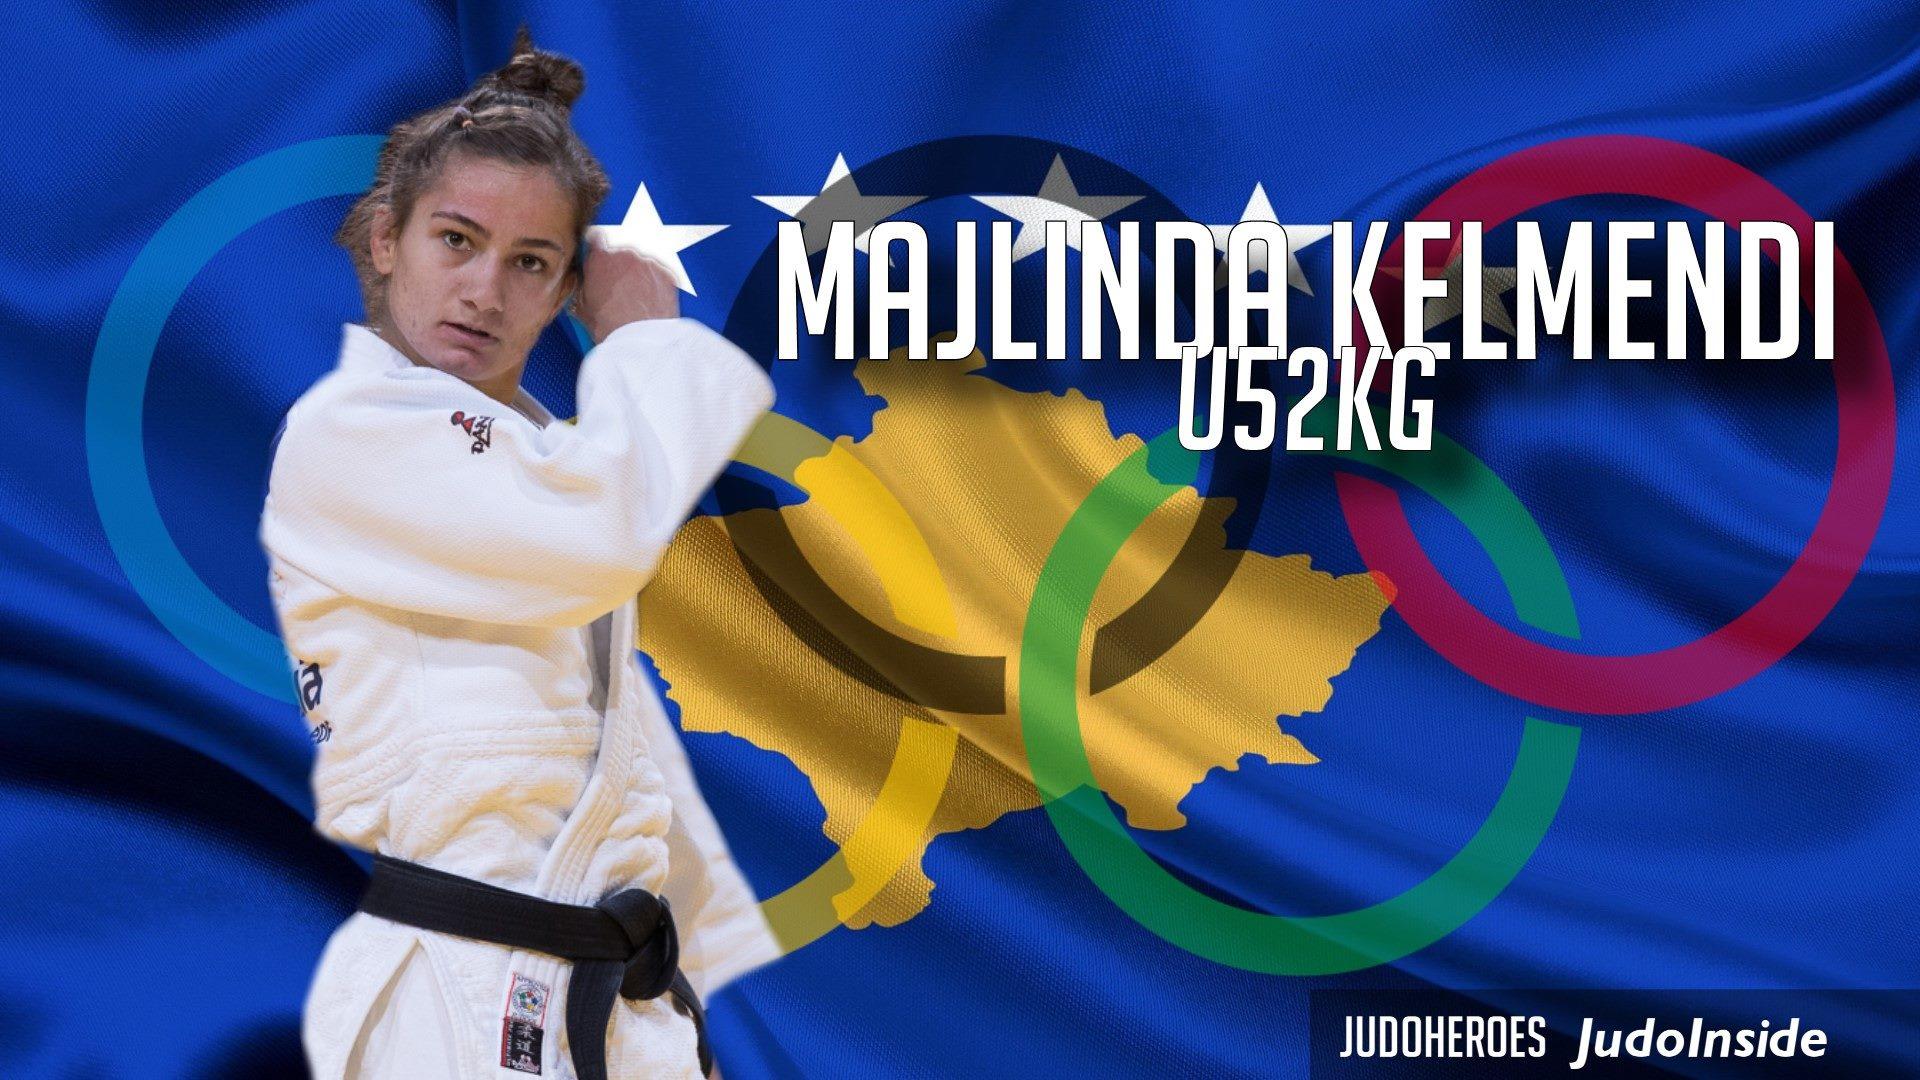 Majlinda Kelmendi announced the best judoka in the world